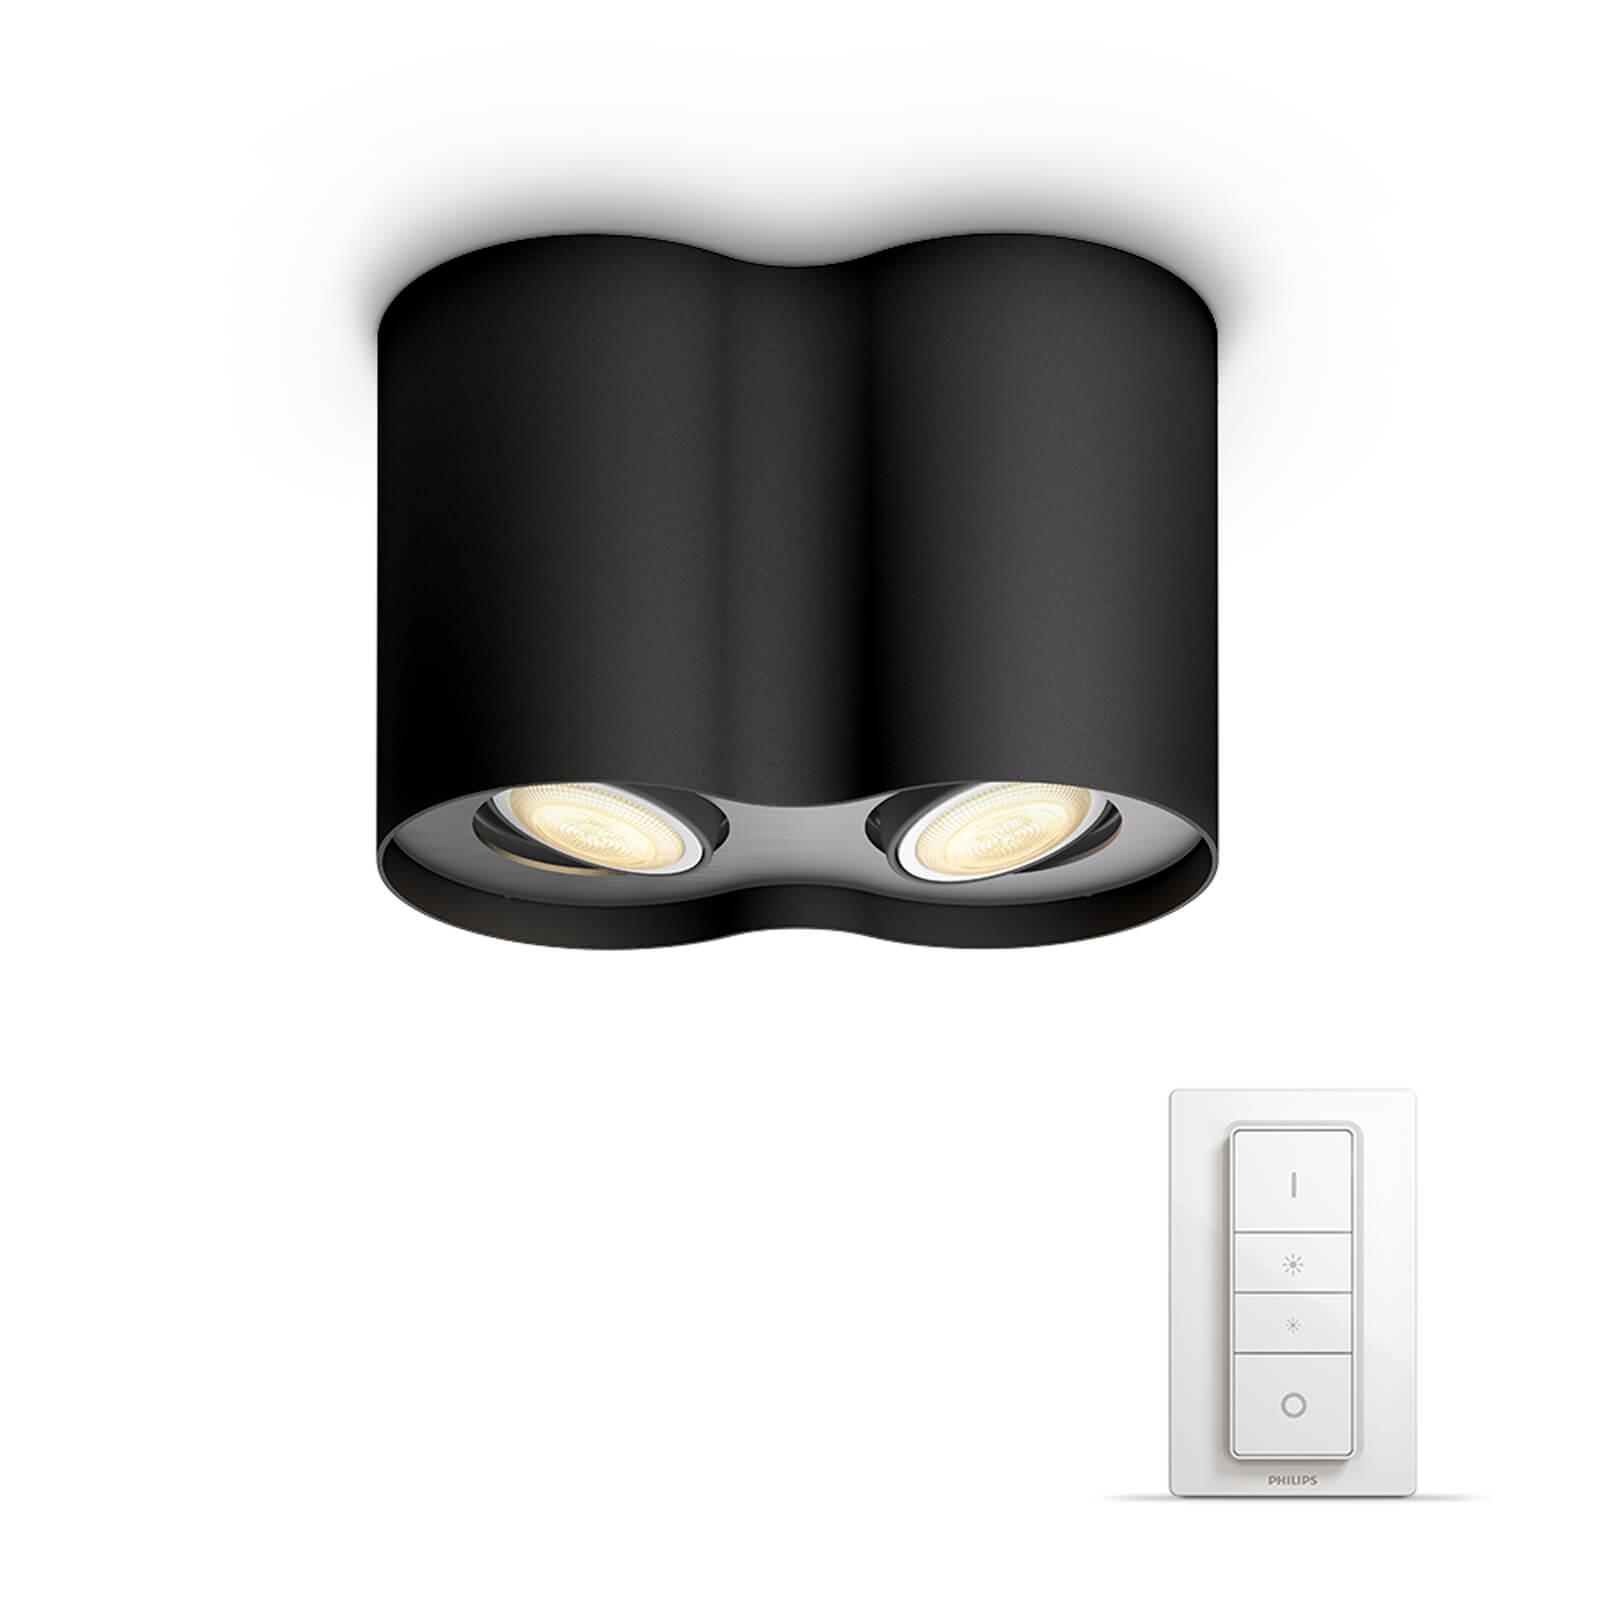 philips hue pillar 2 spot zwart white ambiance incl dim switch. Black Bedroom Furniture Sets. Home Design Ideas